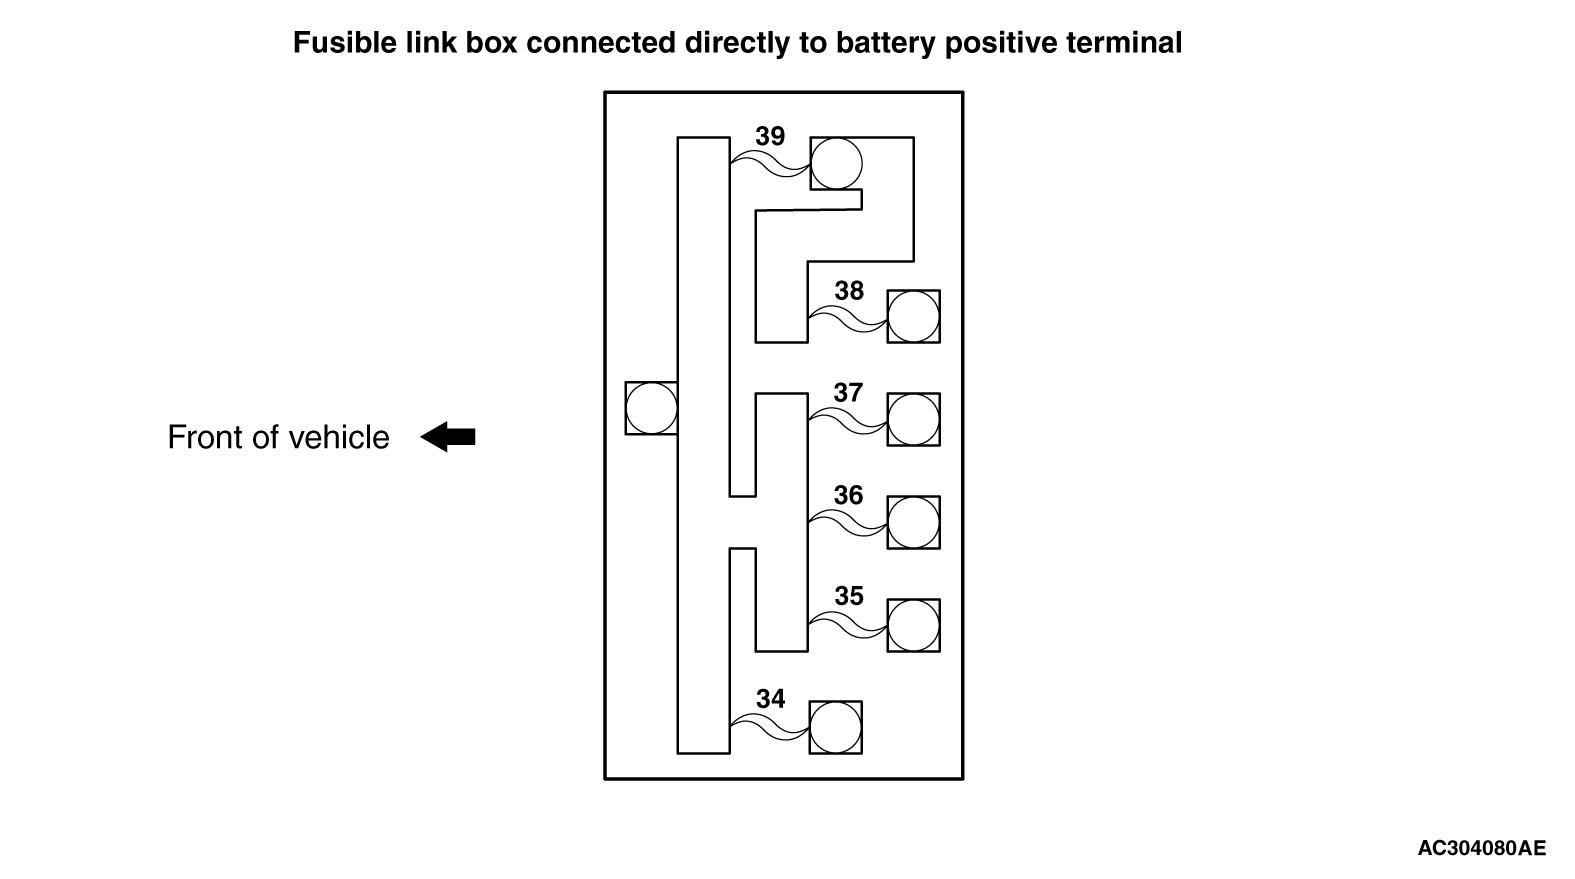 mmc аутлендер xl электросхема CENTRALIZED JUNCTION